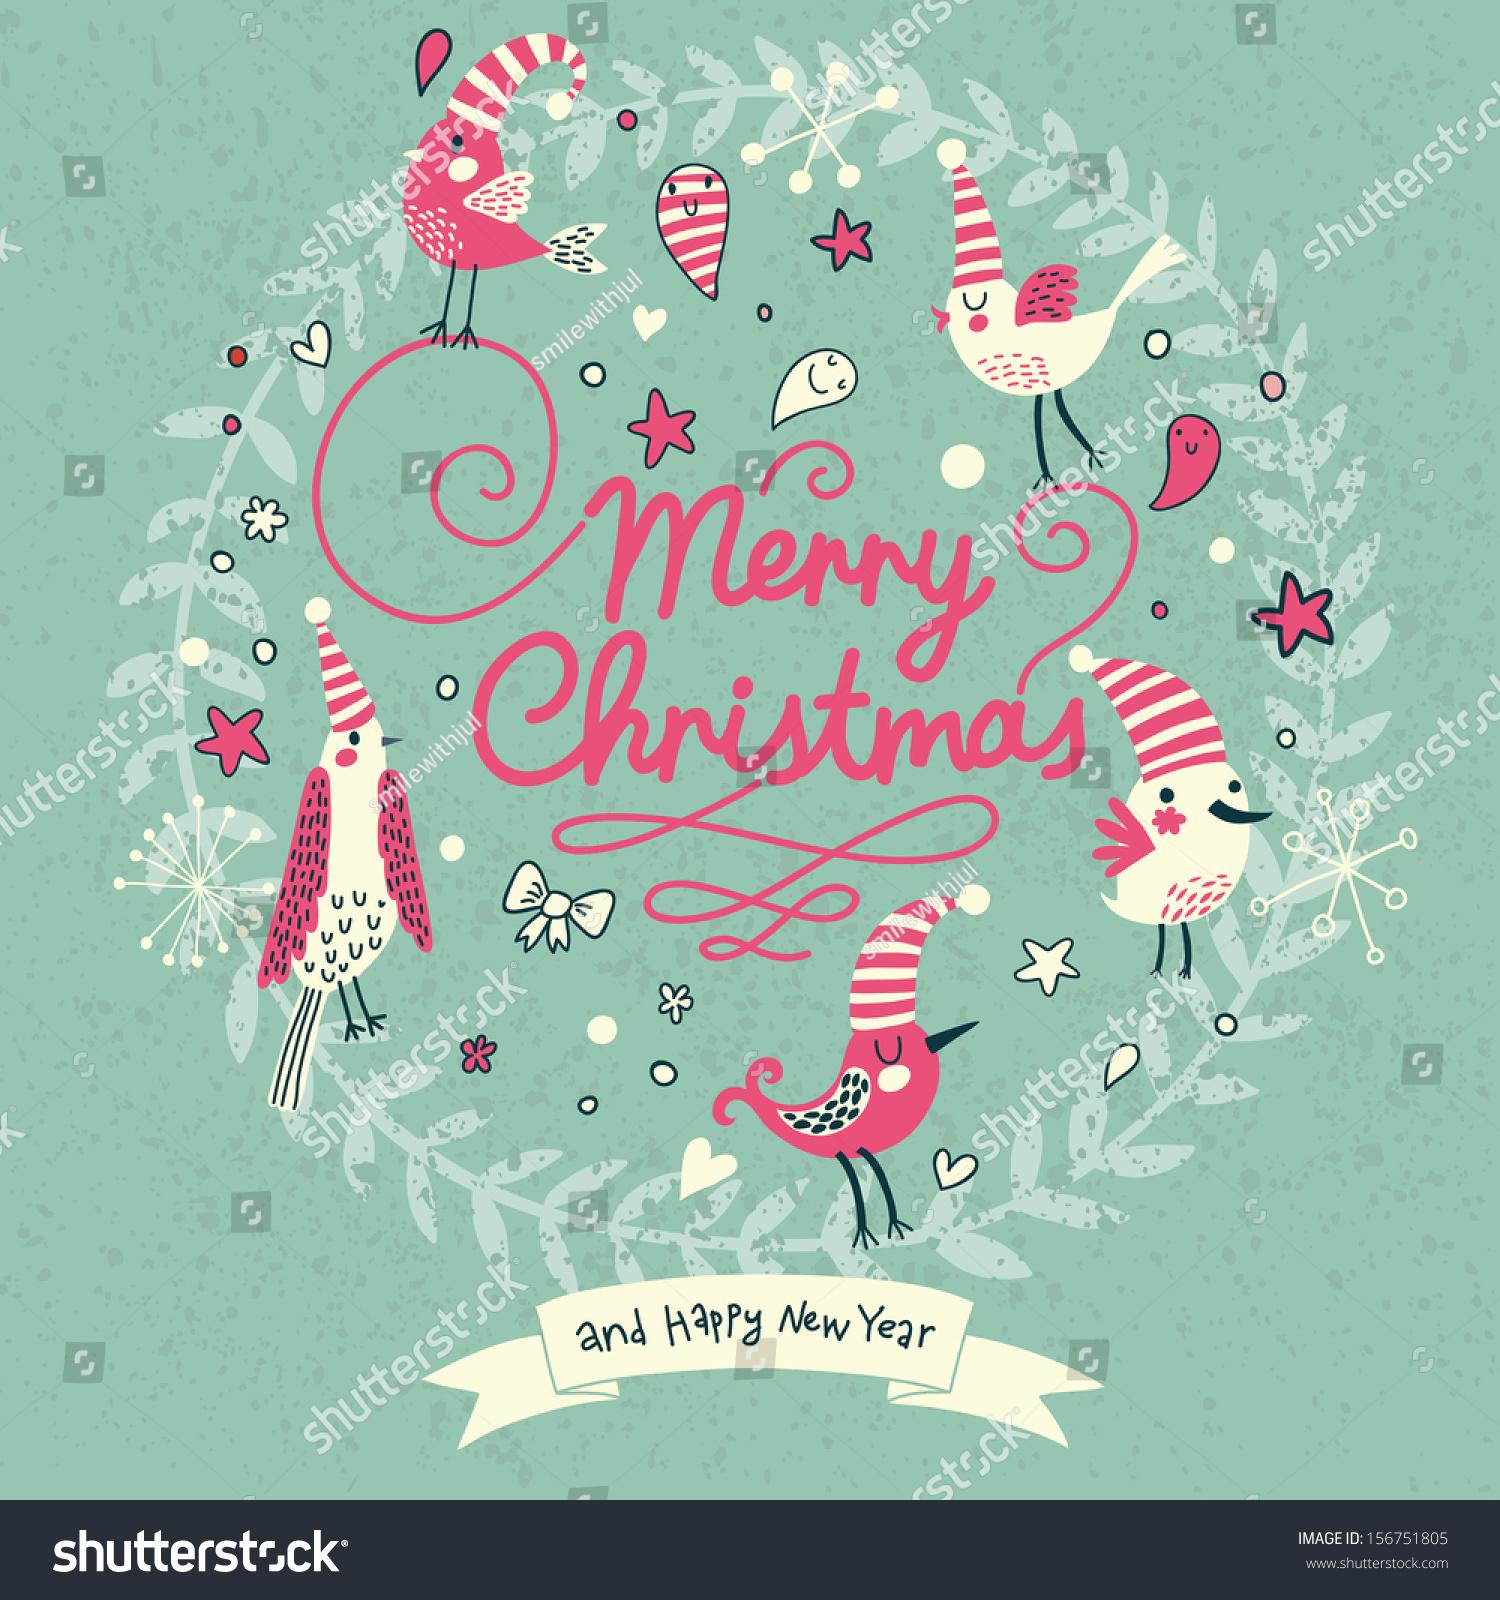 merry christmas card modern popular colors stock vector